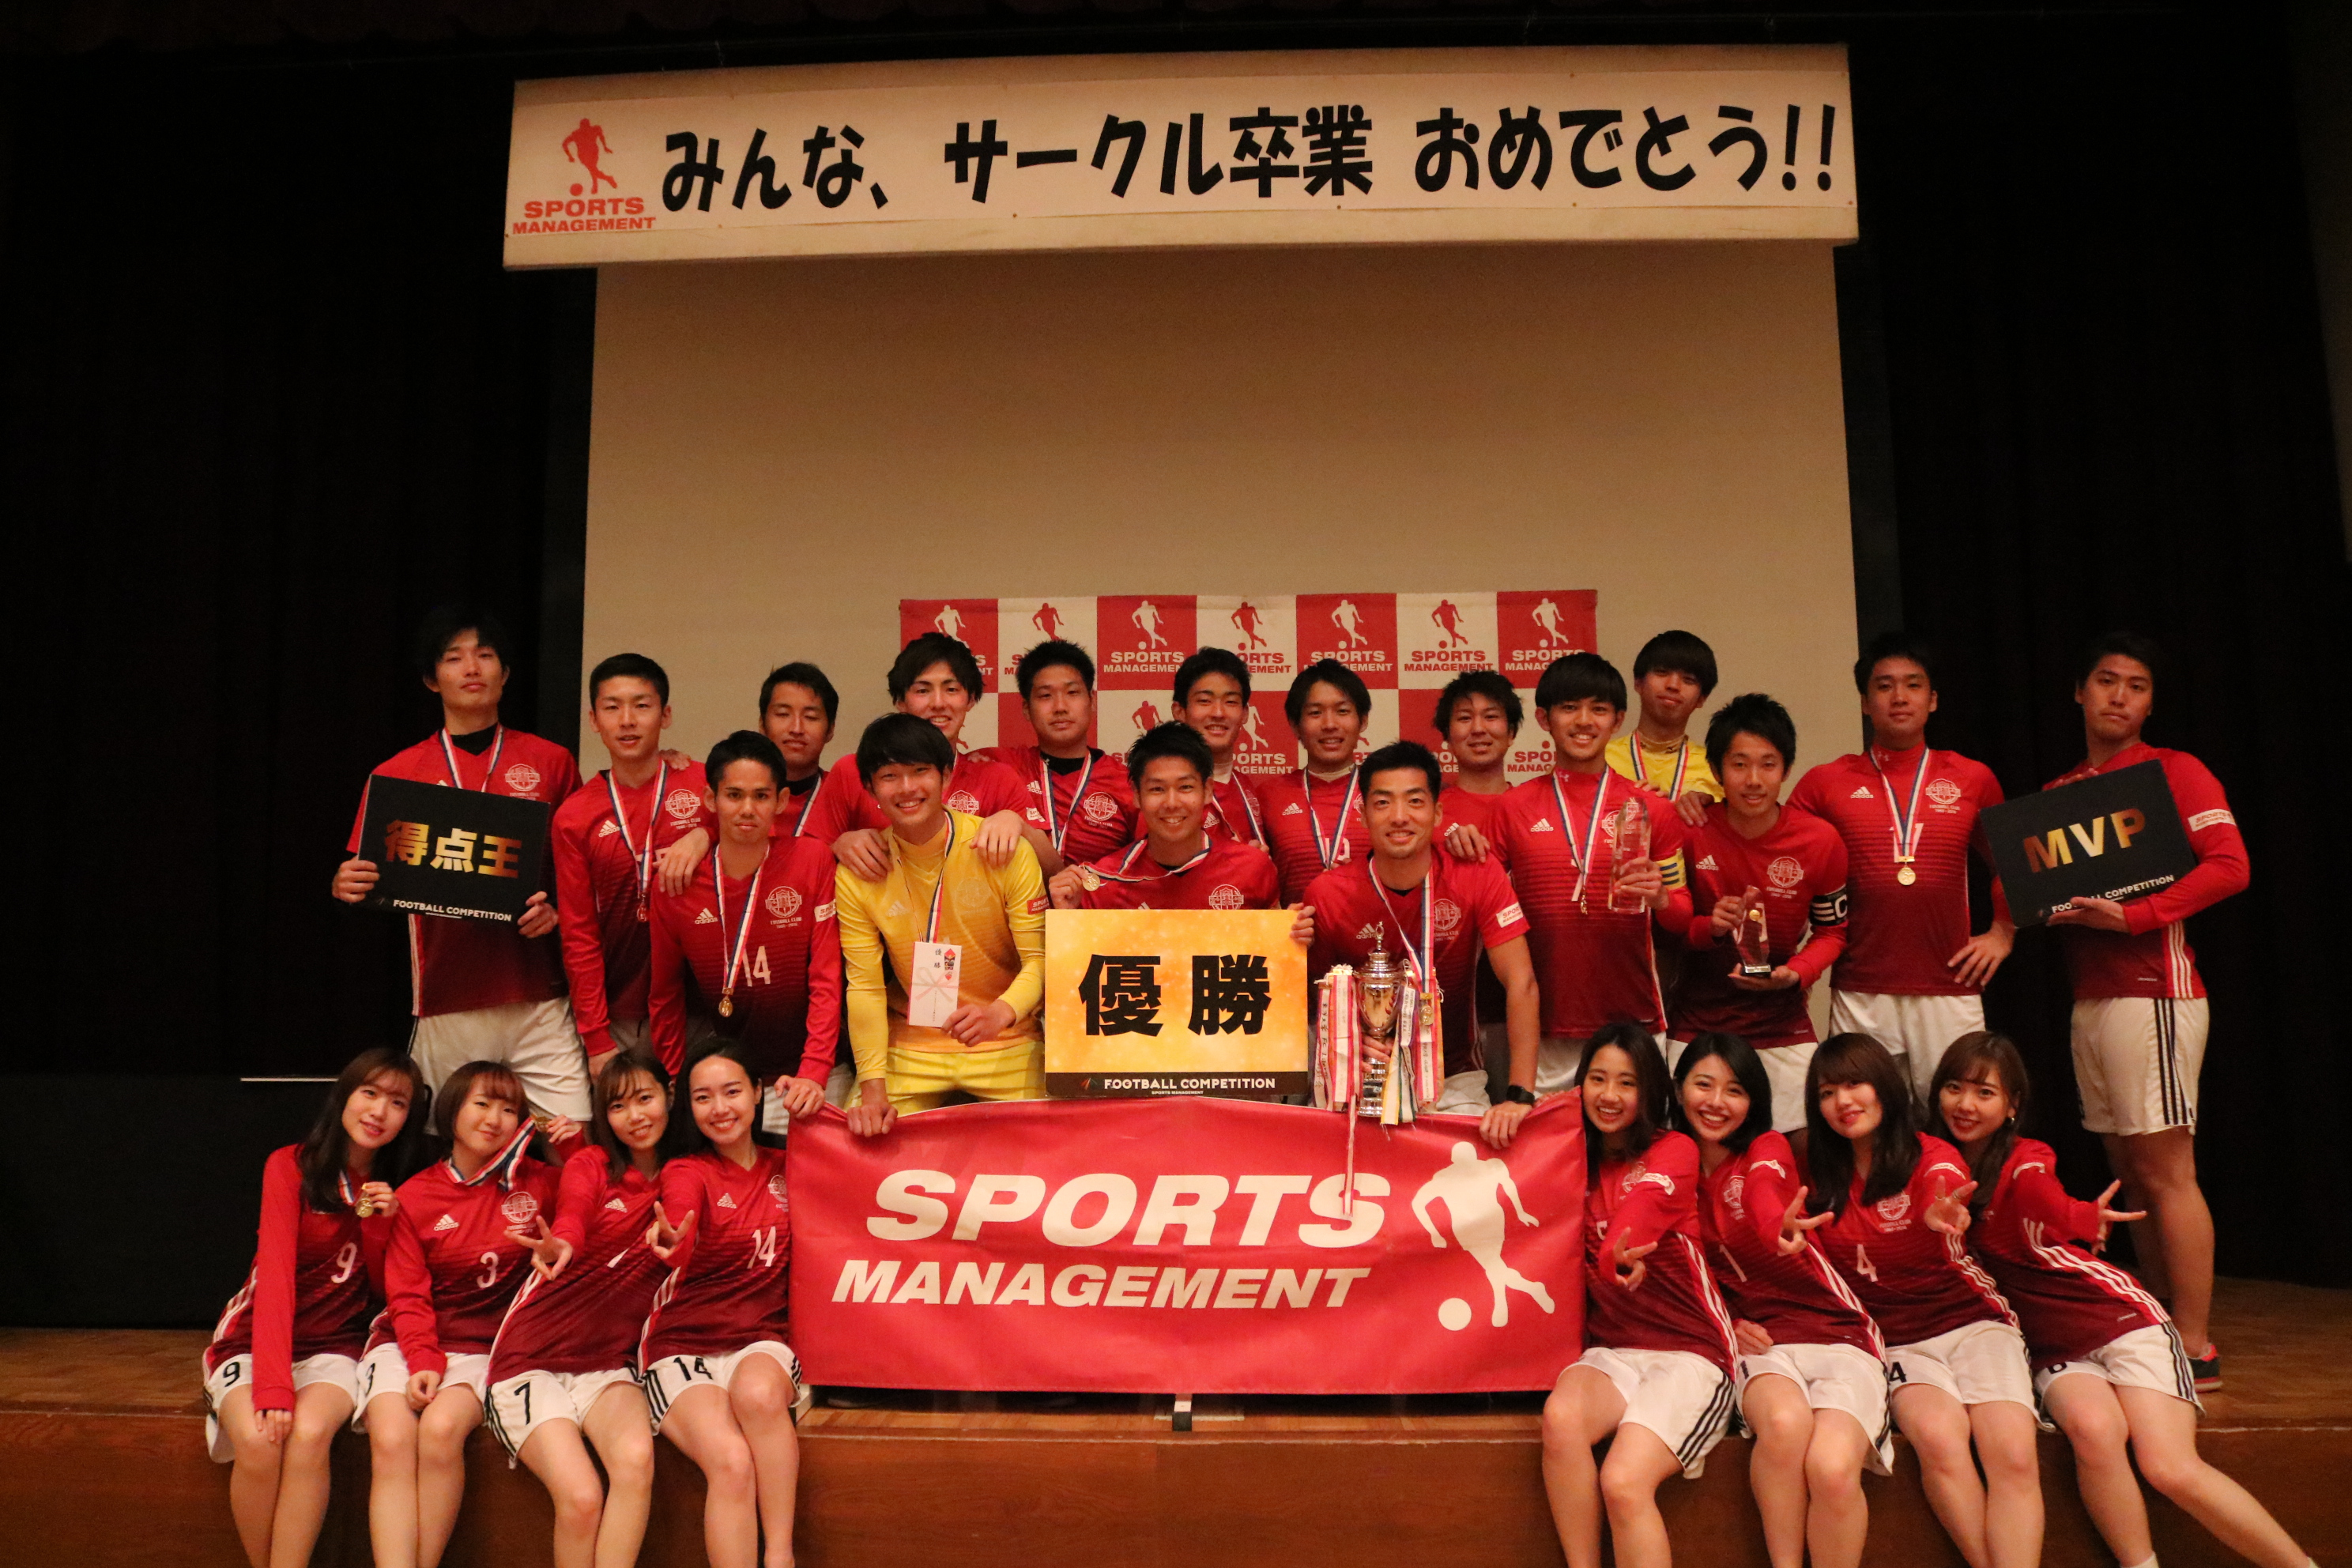 2020/1/31(金)~2/1(土) FOOTBALL COMPETITION 19-20【学年別ROUND】卒業生